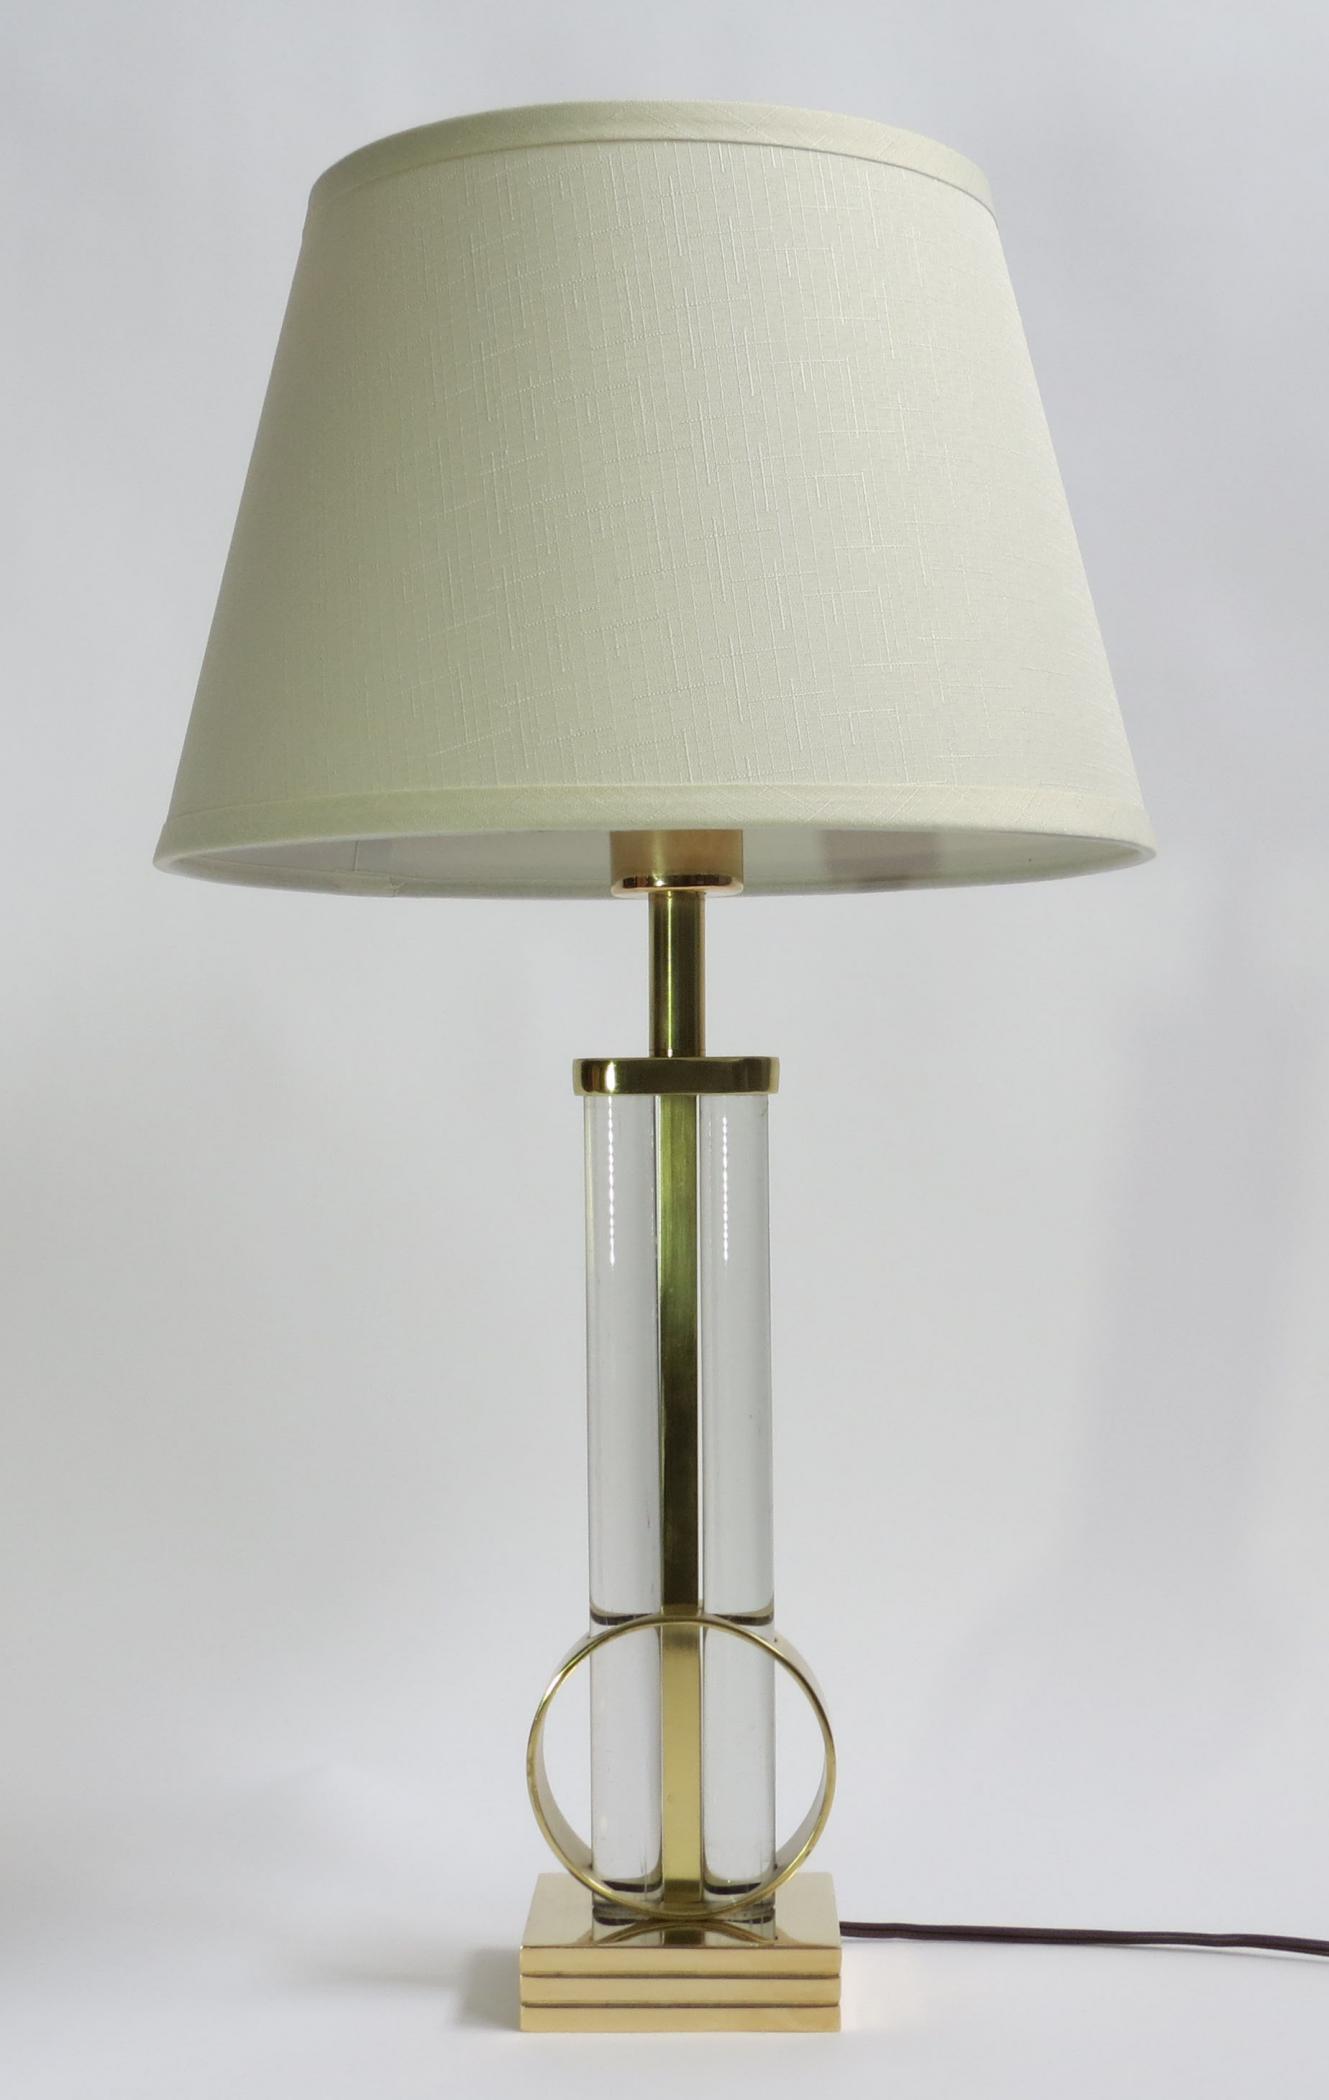 Gilbert Rohde American Art Deco Table Lamp Modernism